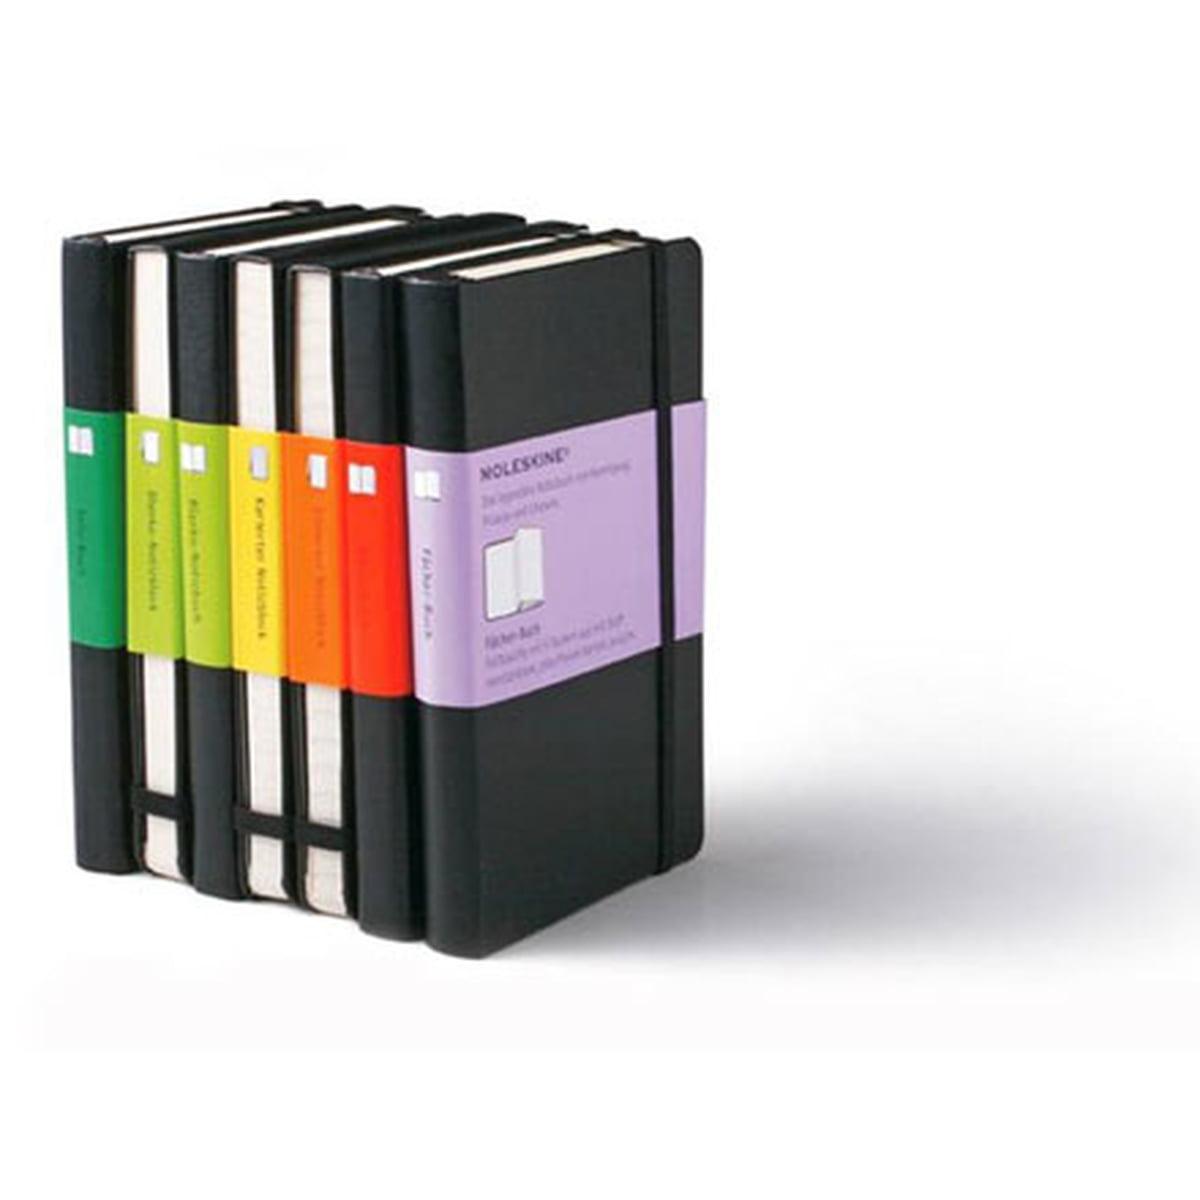 Moleskine Notebooks - Pocket in the shop